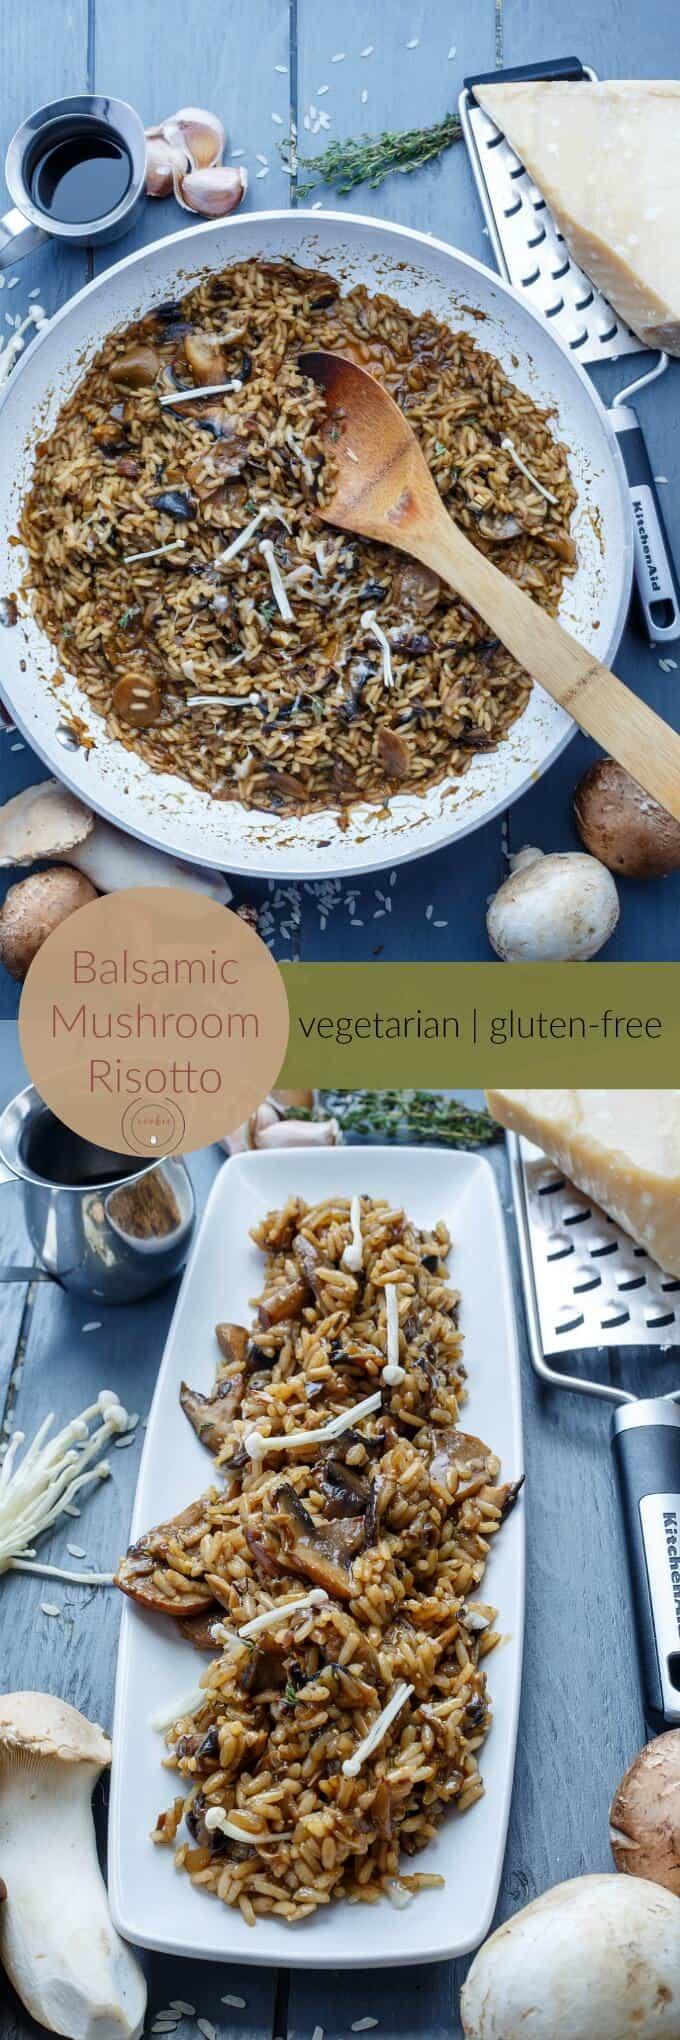 Balsamic Mushroom Risotto